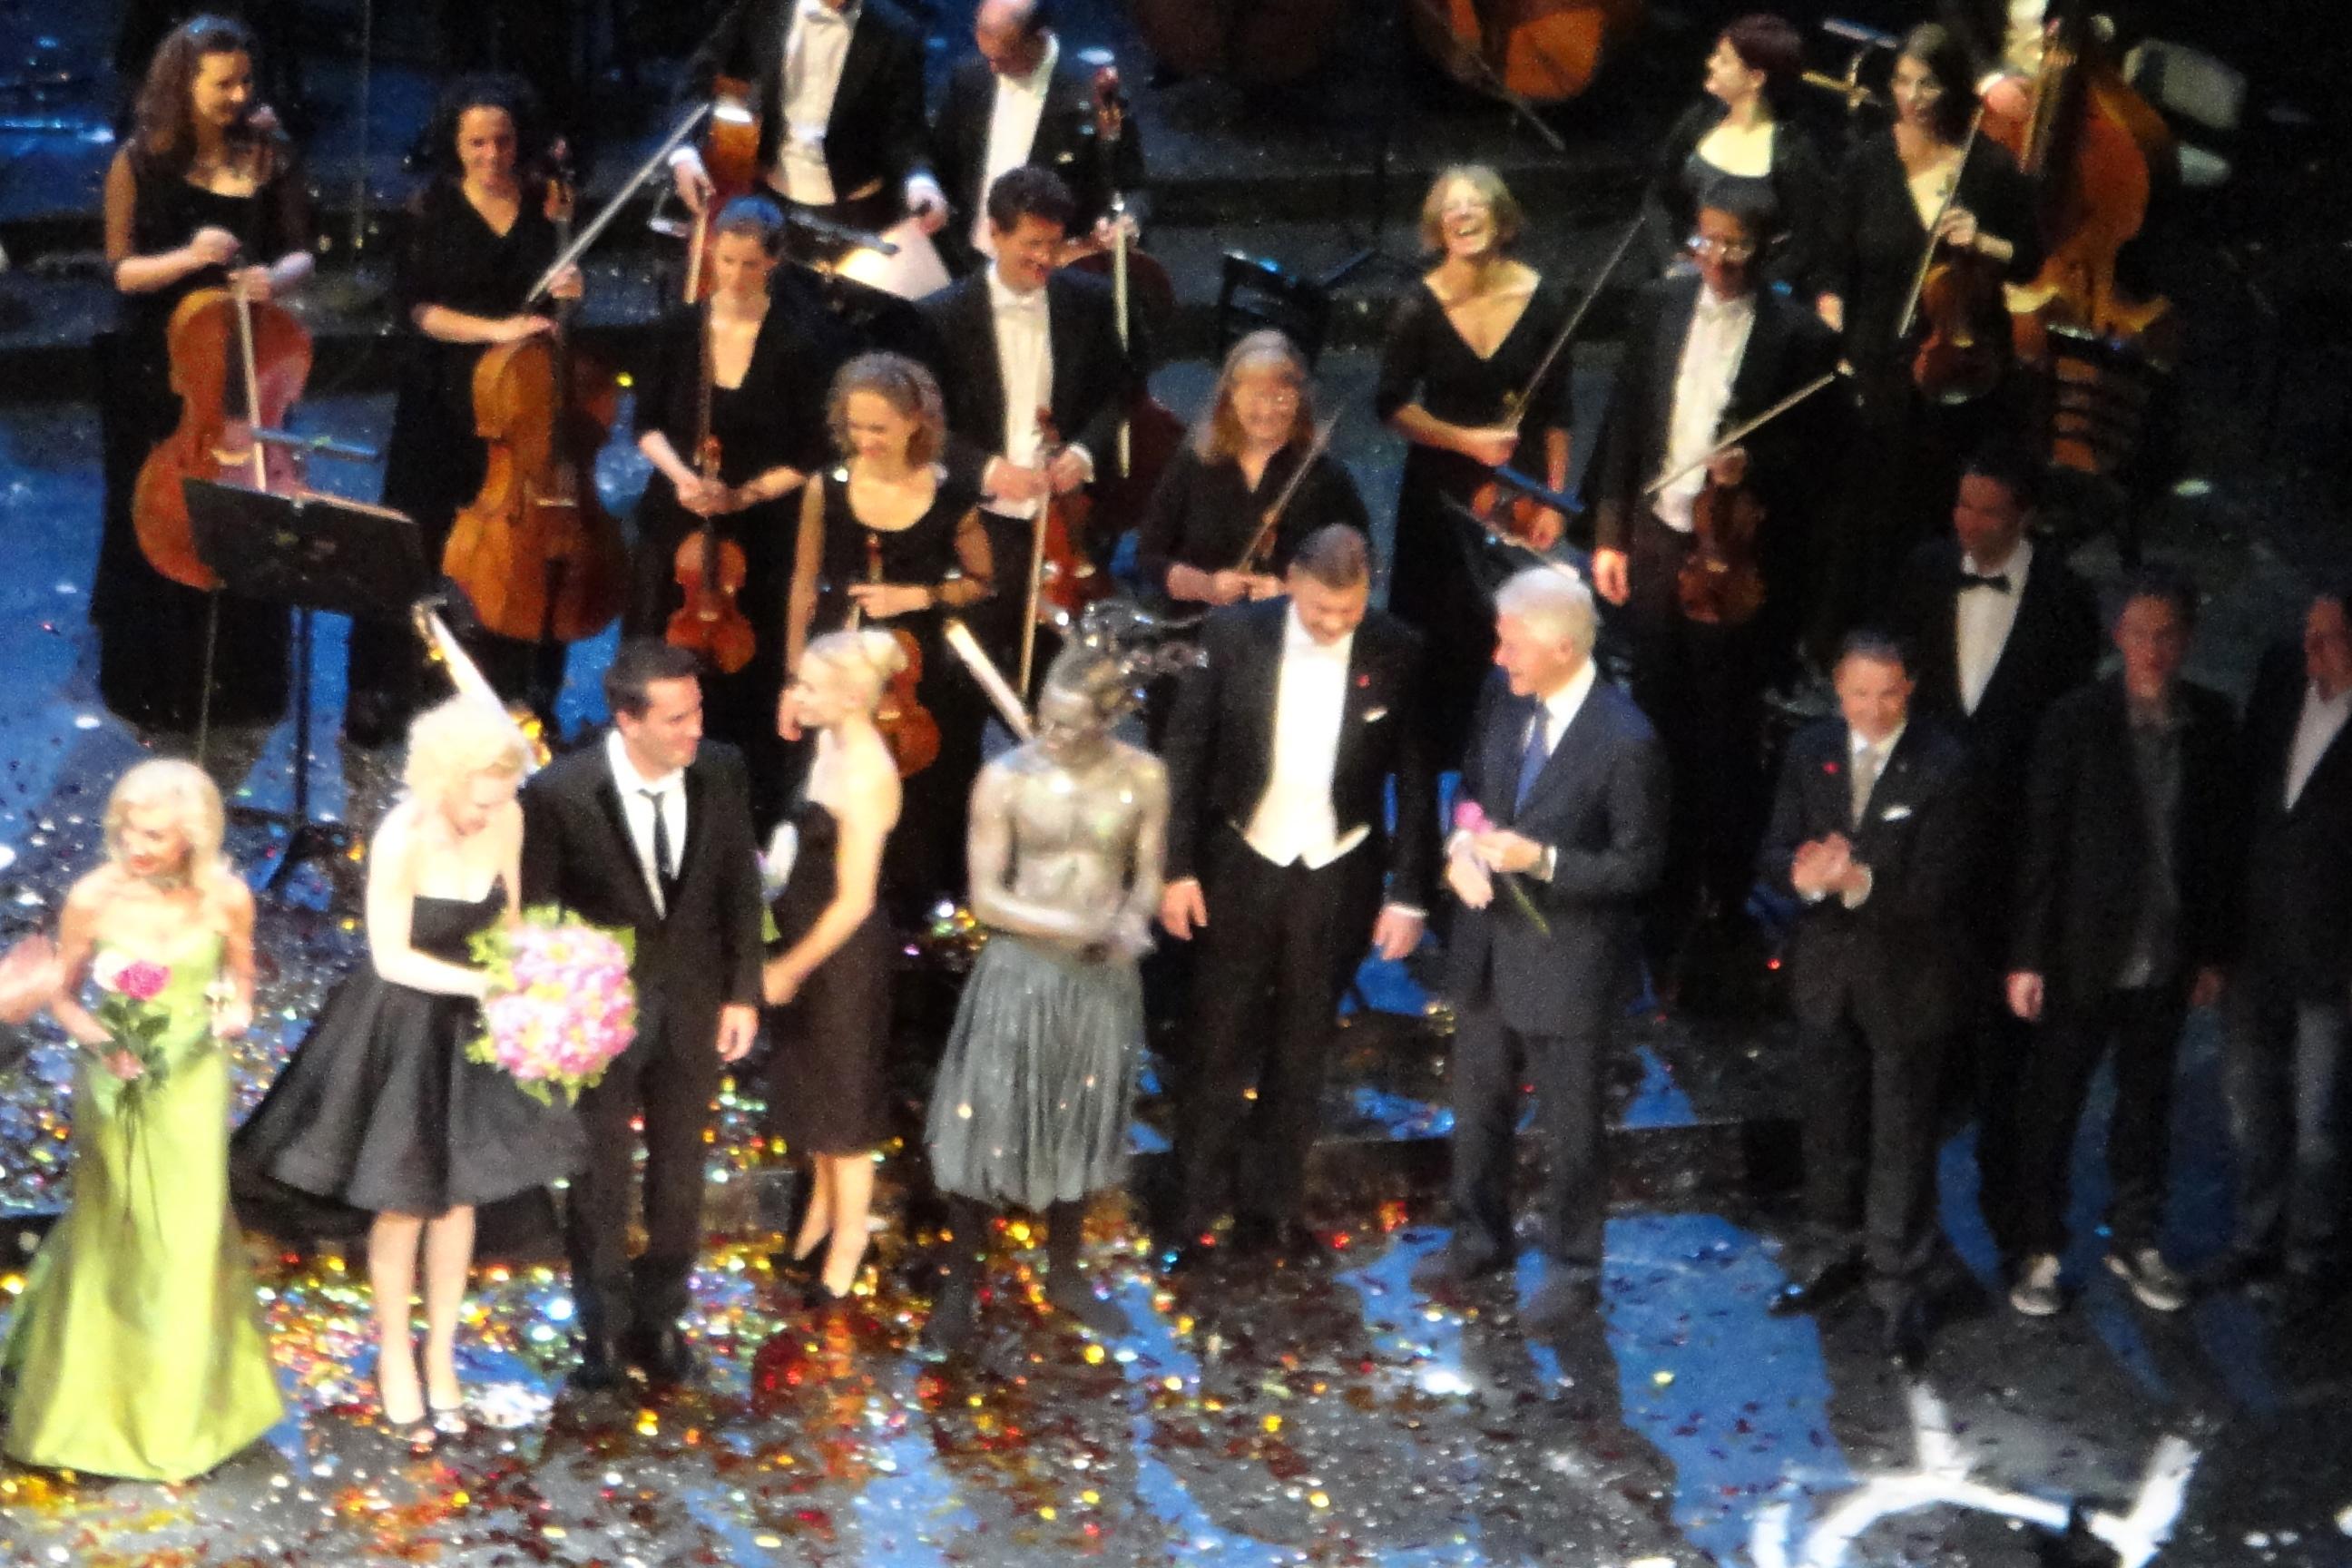 Burtheater - Red Ribbon Celebration Concert